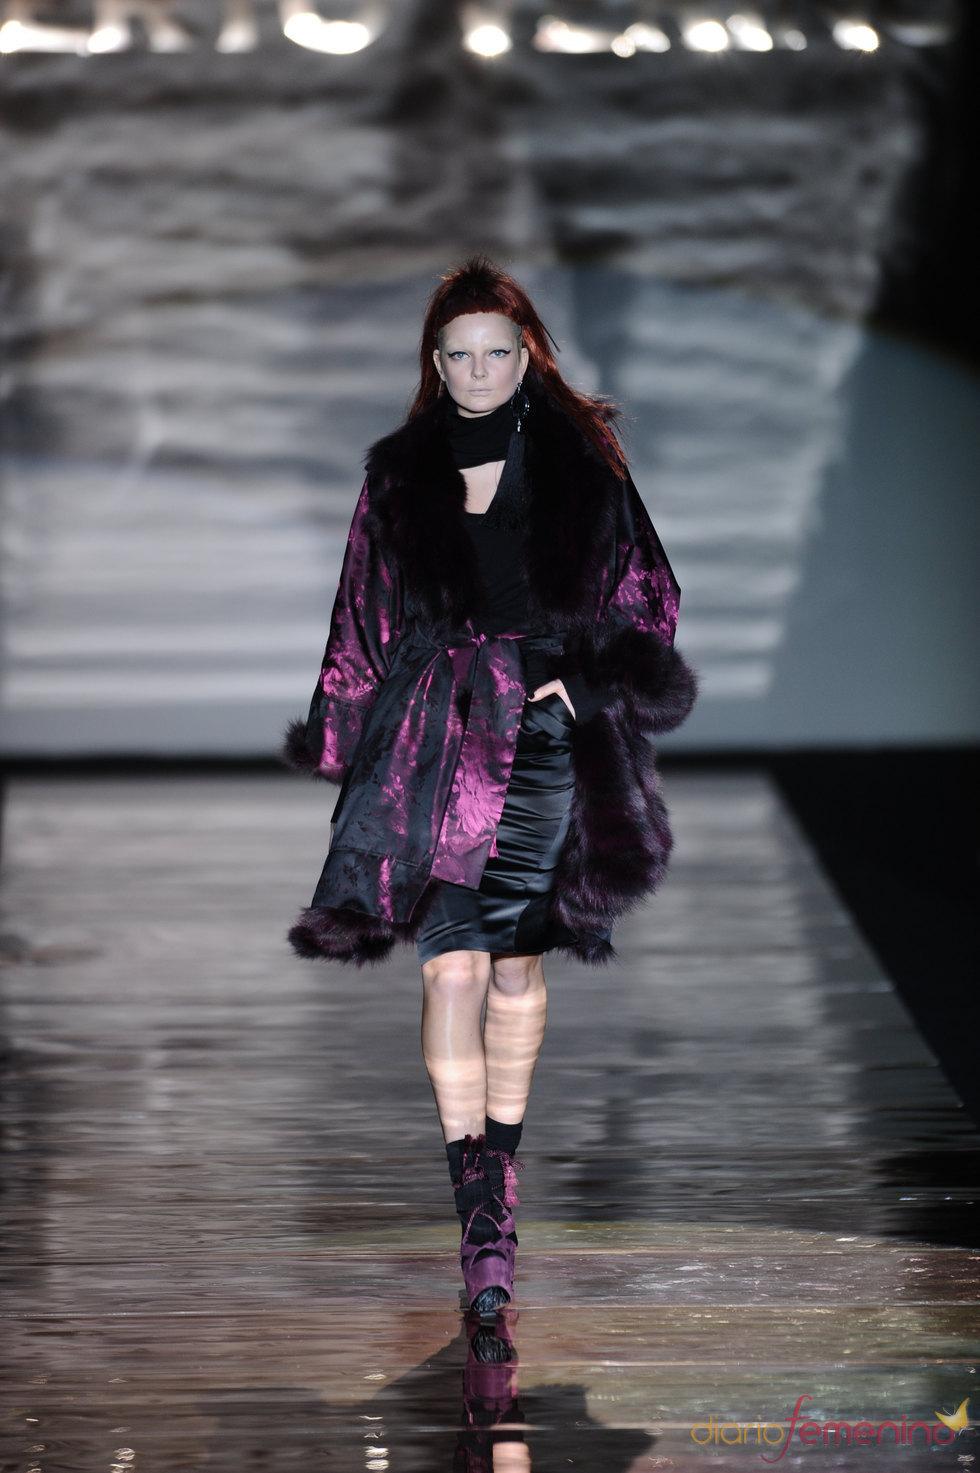 Conjunto negro y violeta. Roberto Verino. Cibeles Madrid Fashion Week 2011